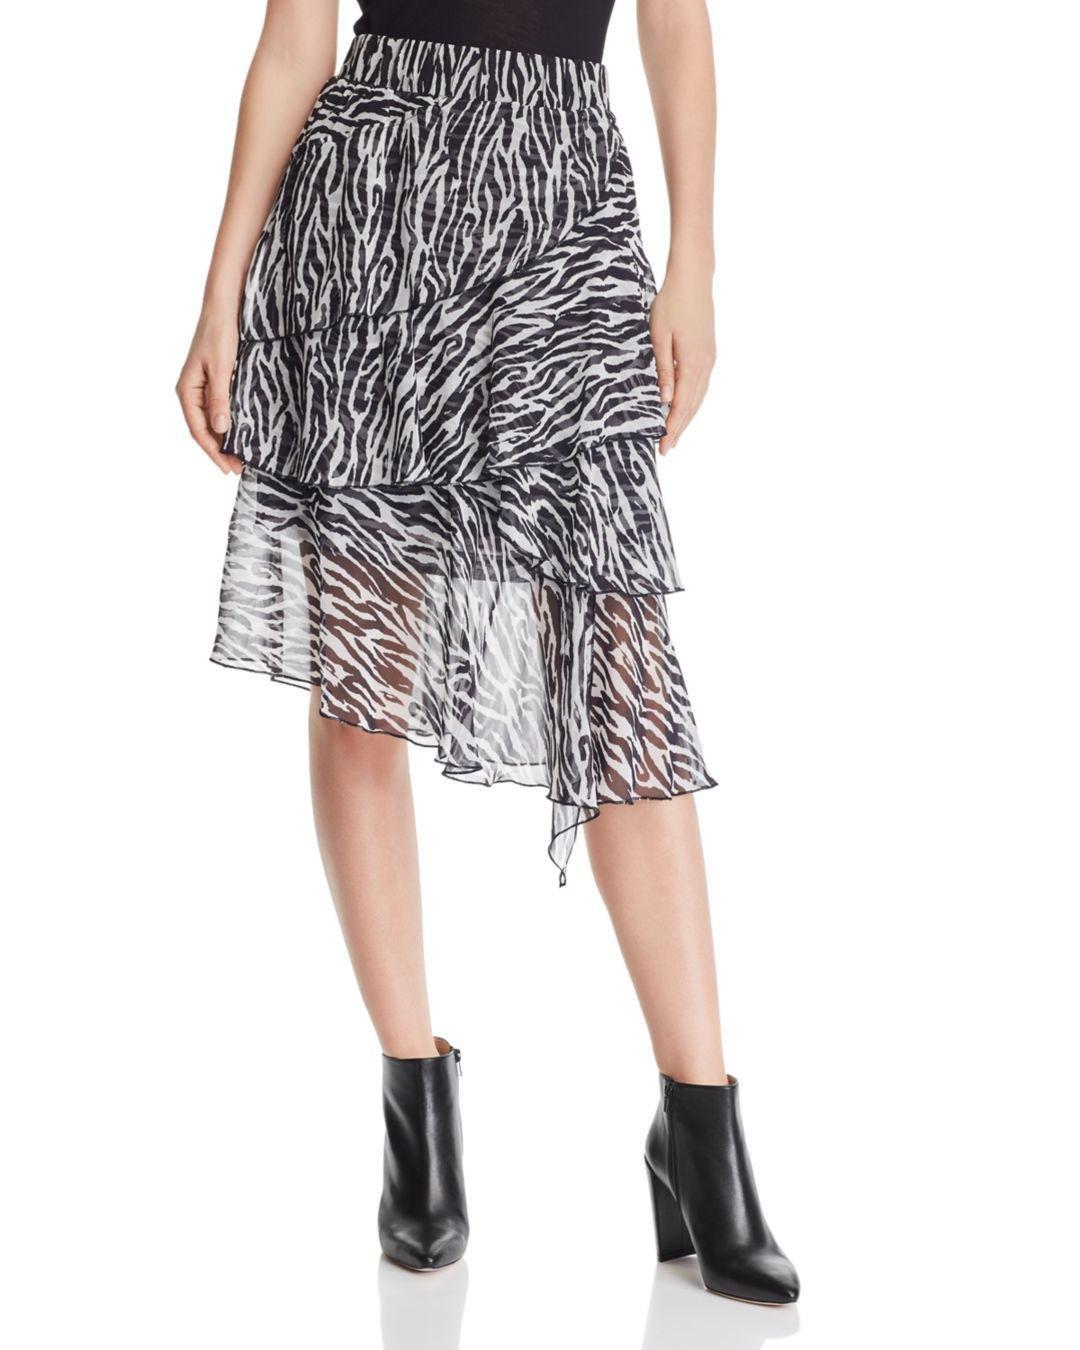 d554ae963af3 Lyst - Lucy Paris Asymmetric Zebra-print Midi Skirt in Black